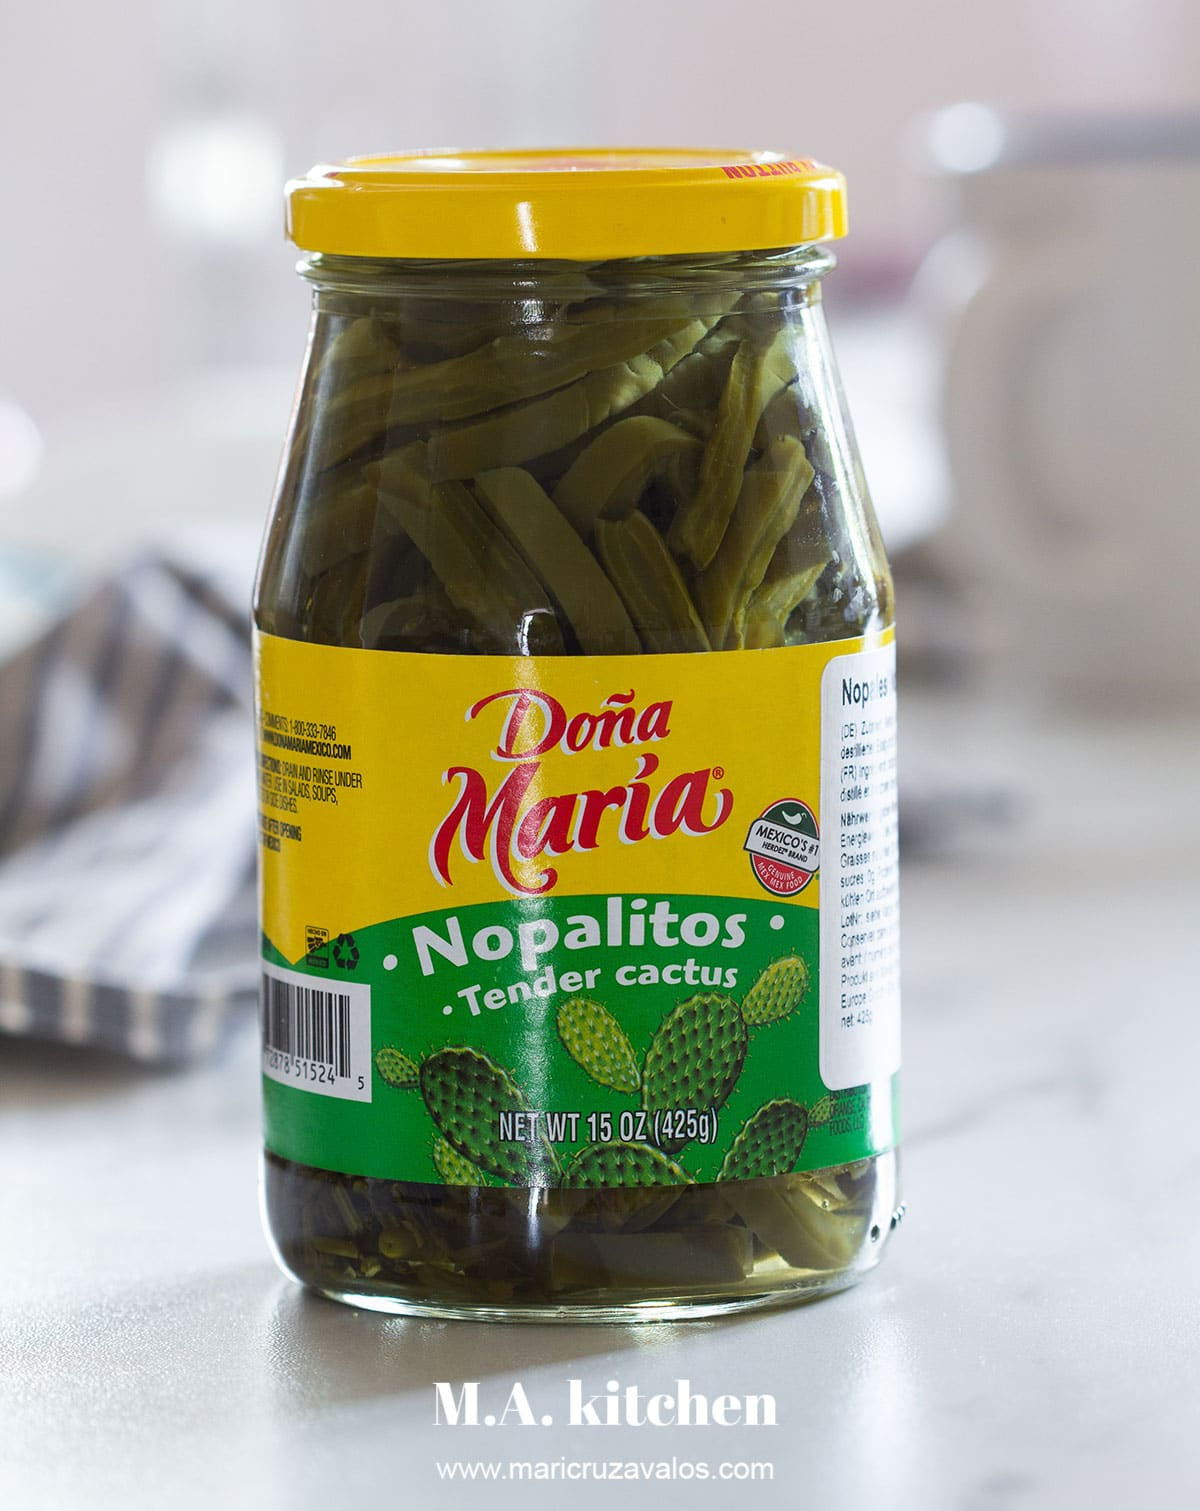 A jar of Doña Maria nopales.